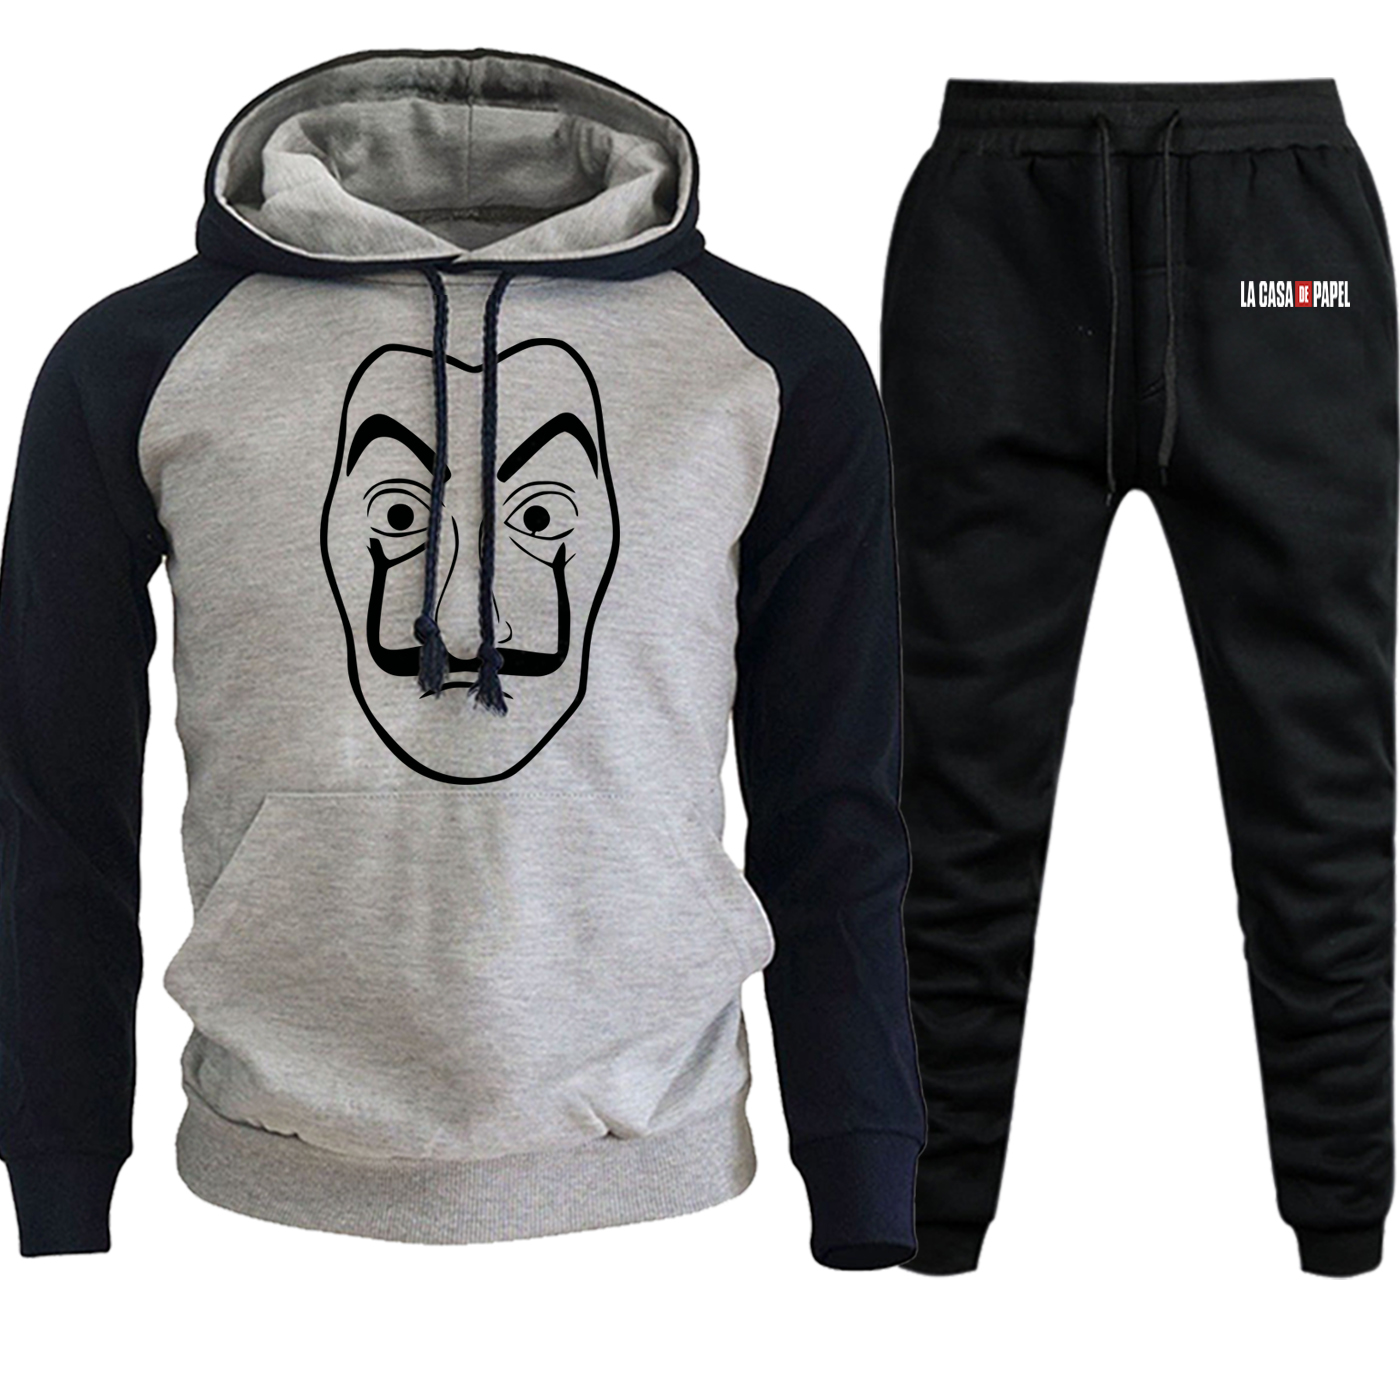 La Casa De Papel Streetwear Mens Raglan Hoodies Autumn Winter 2019 Suit Male Casual Pullover Hip Hop Hooded+Pants 2 Piece Set